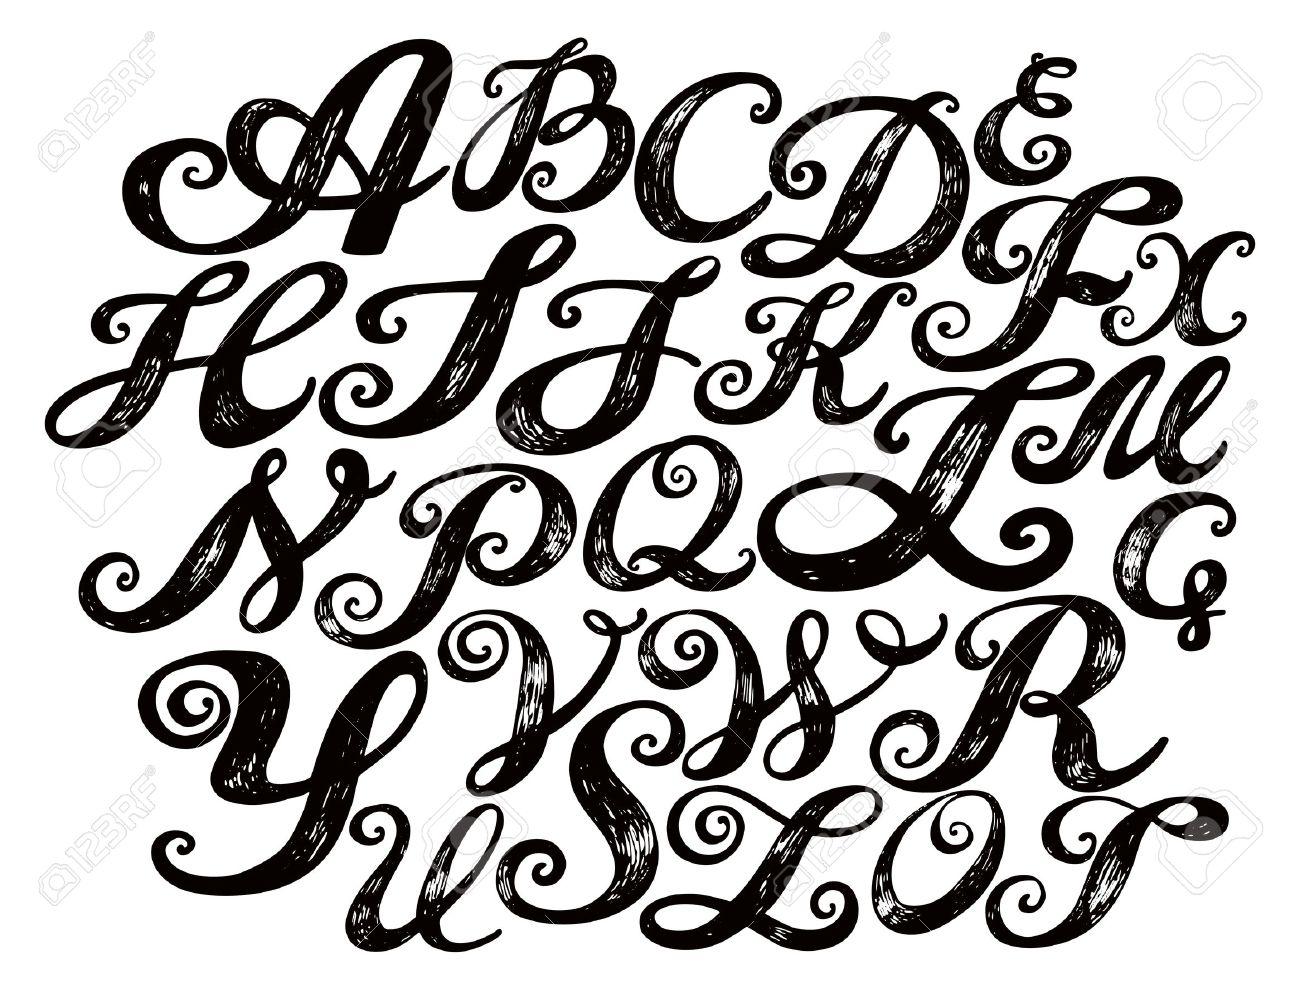 1300x1002 Calligraphy Alphabet Typeset Lettering. Hand Drawn Alphabet